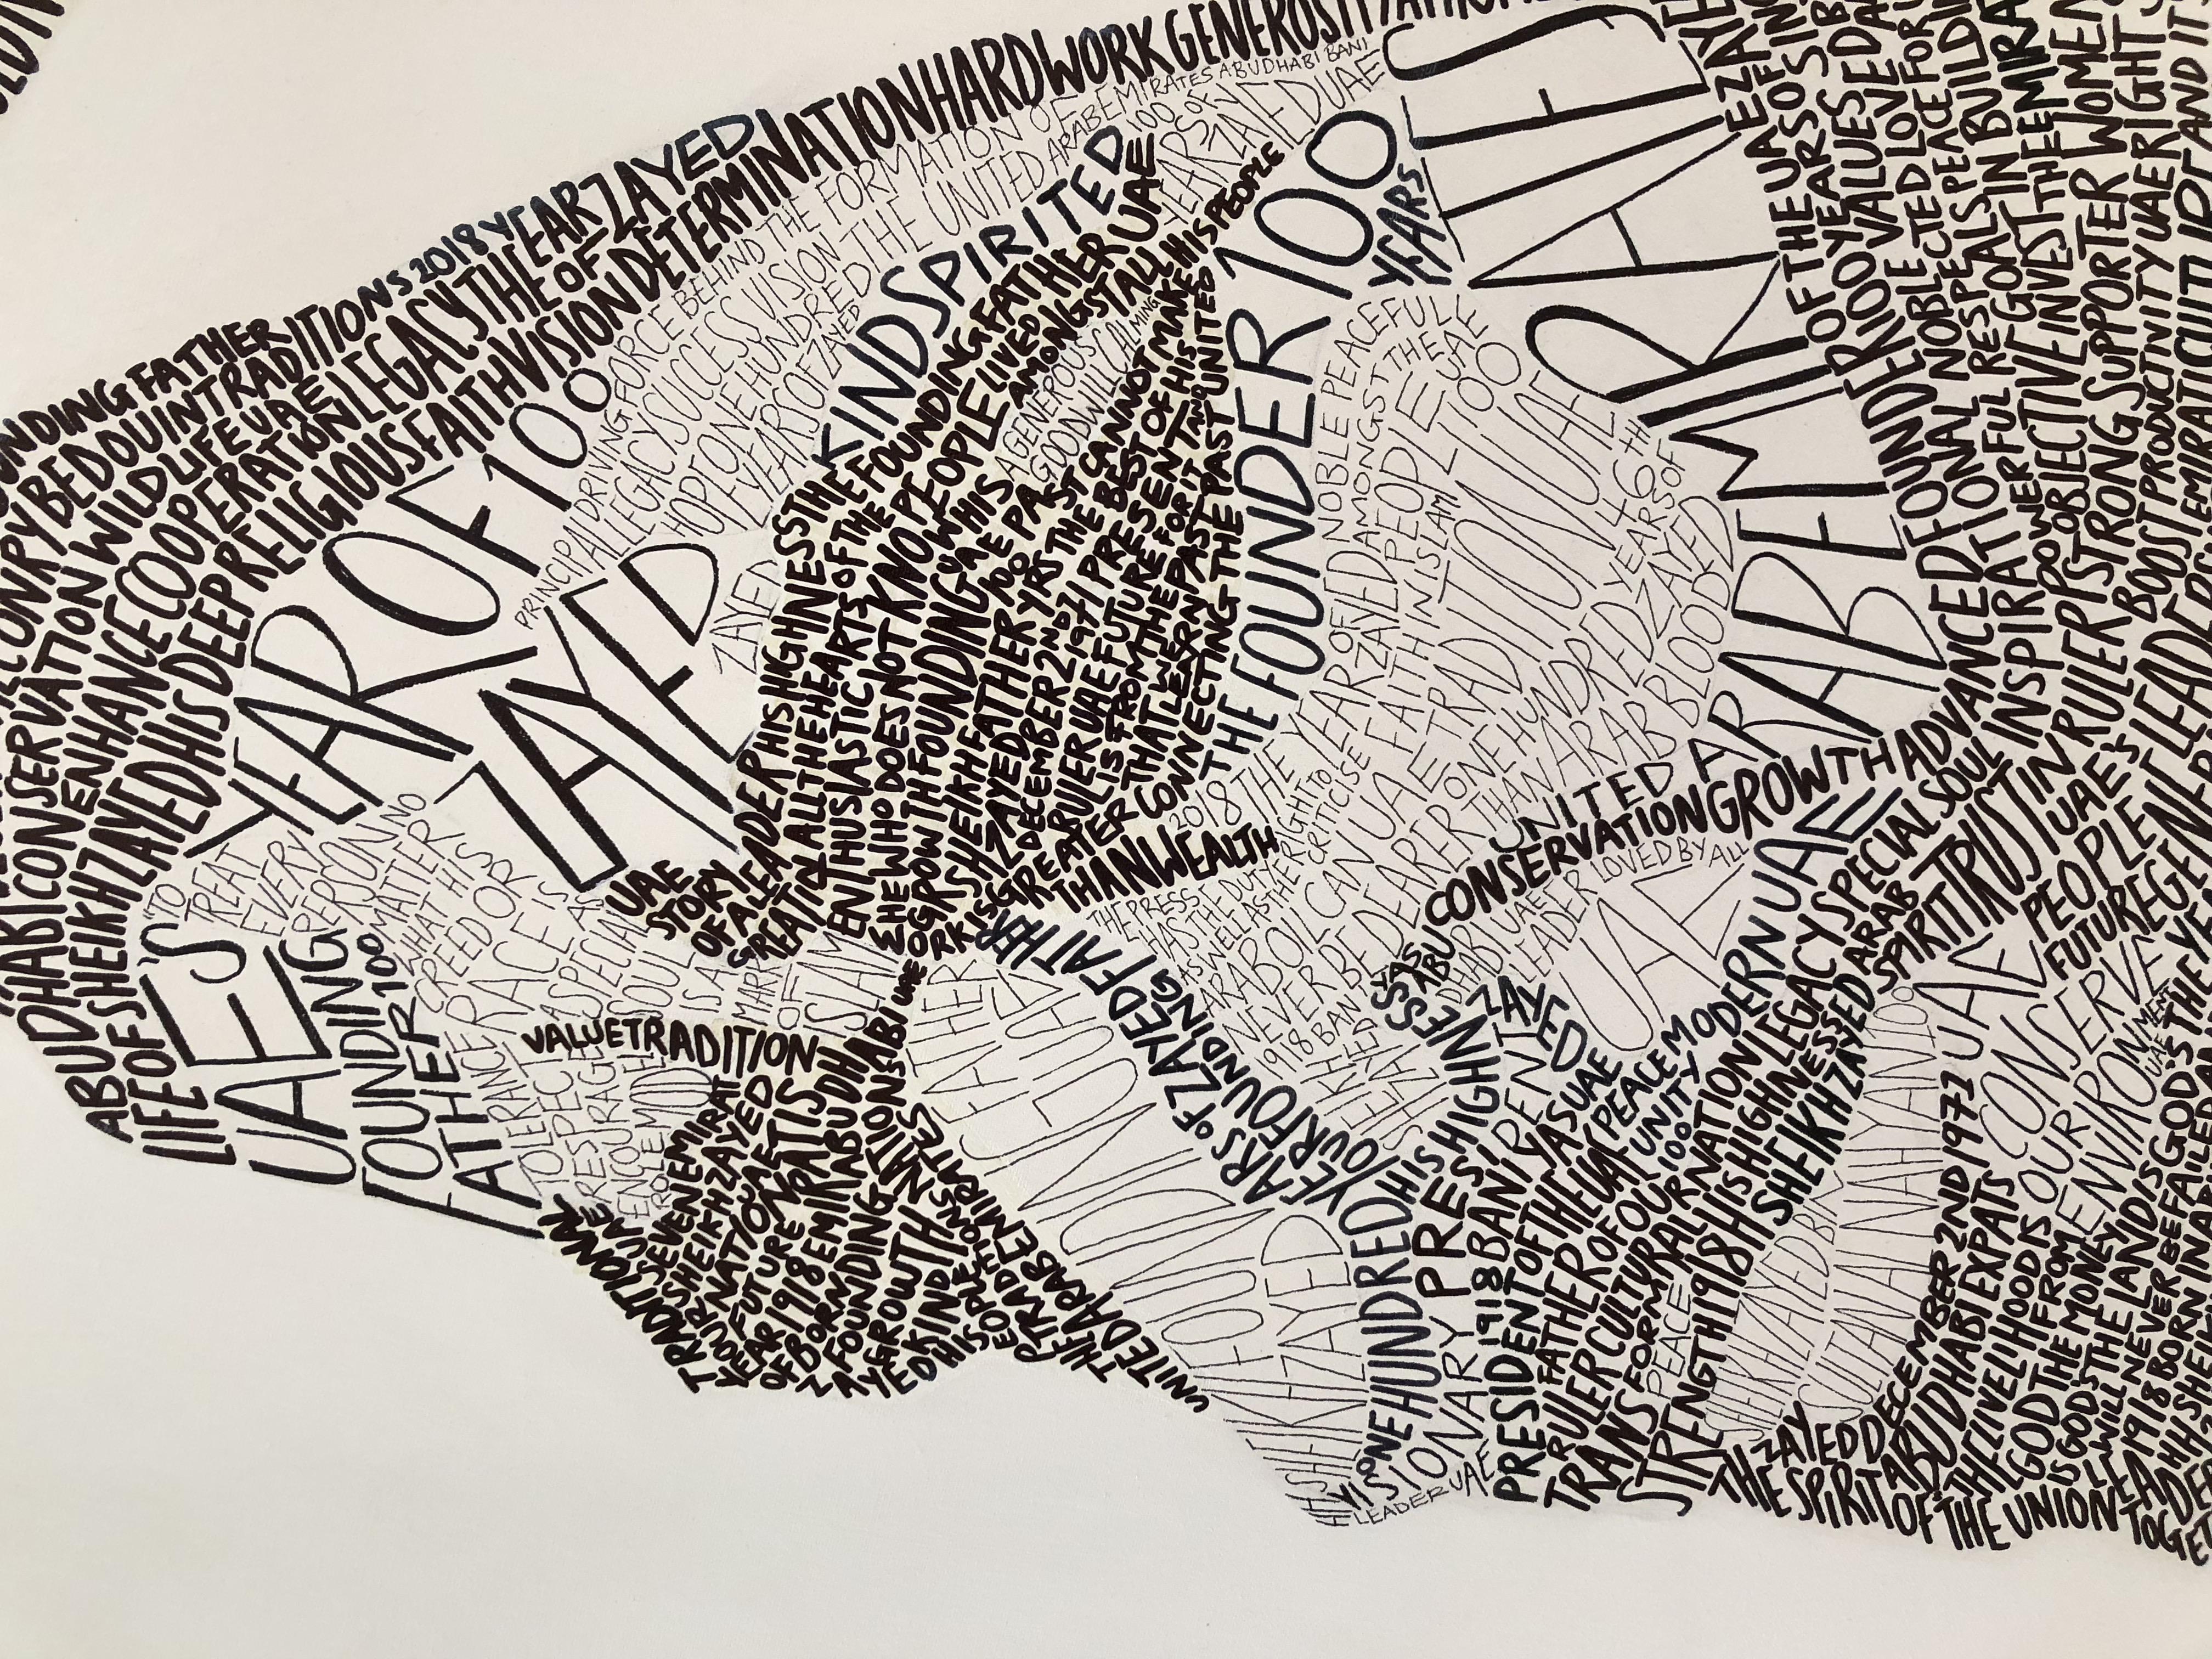 Story Of A Leader Natalie Daghestani Art Dubai Artist BSAB 6